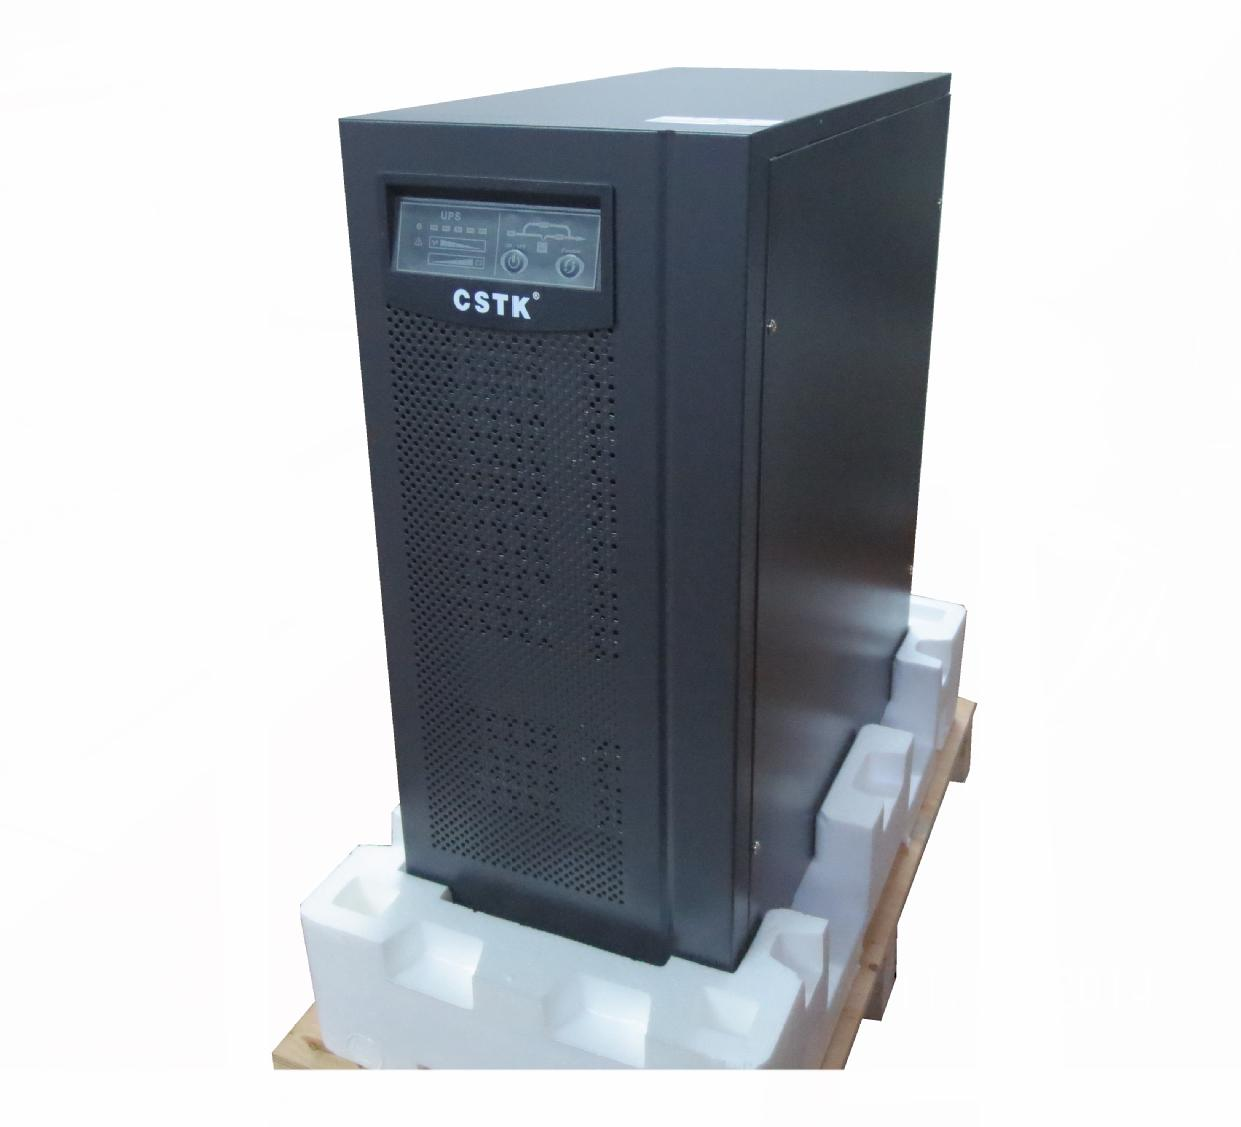 CSTK3C20KSUPSホストいち台12V65AH電池じゅうろくだけA16箱いちの20KVA半時間